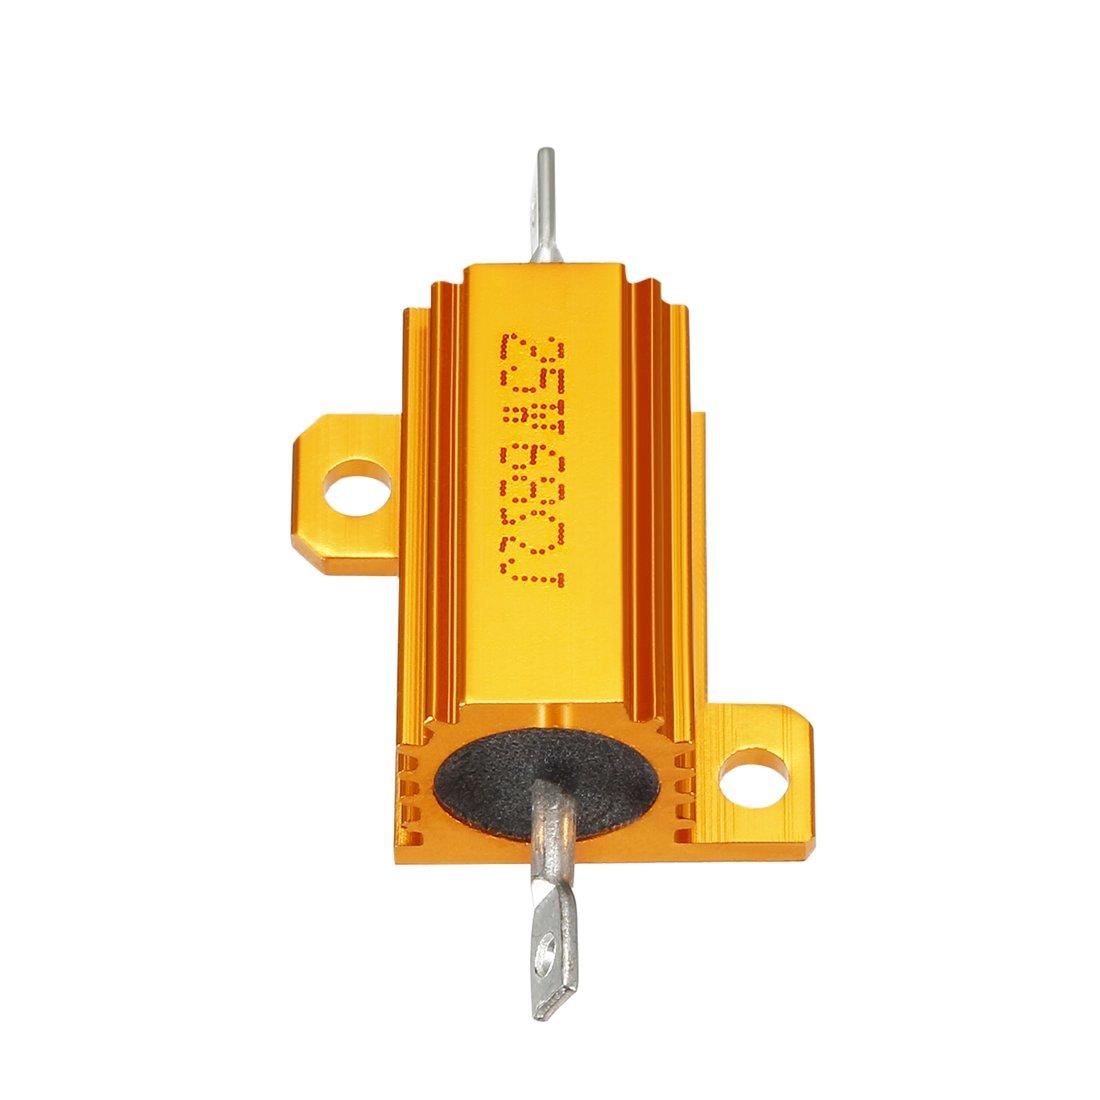 sourcingmap 25W 12 Ohm 5/% Aluminum Housing Resistor Screw Tap Mounted Aluminum Case Wirewound ResistorGold Tone RX24 25W12RJ 2 pcs